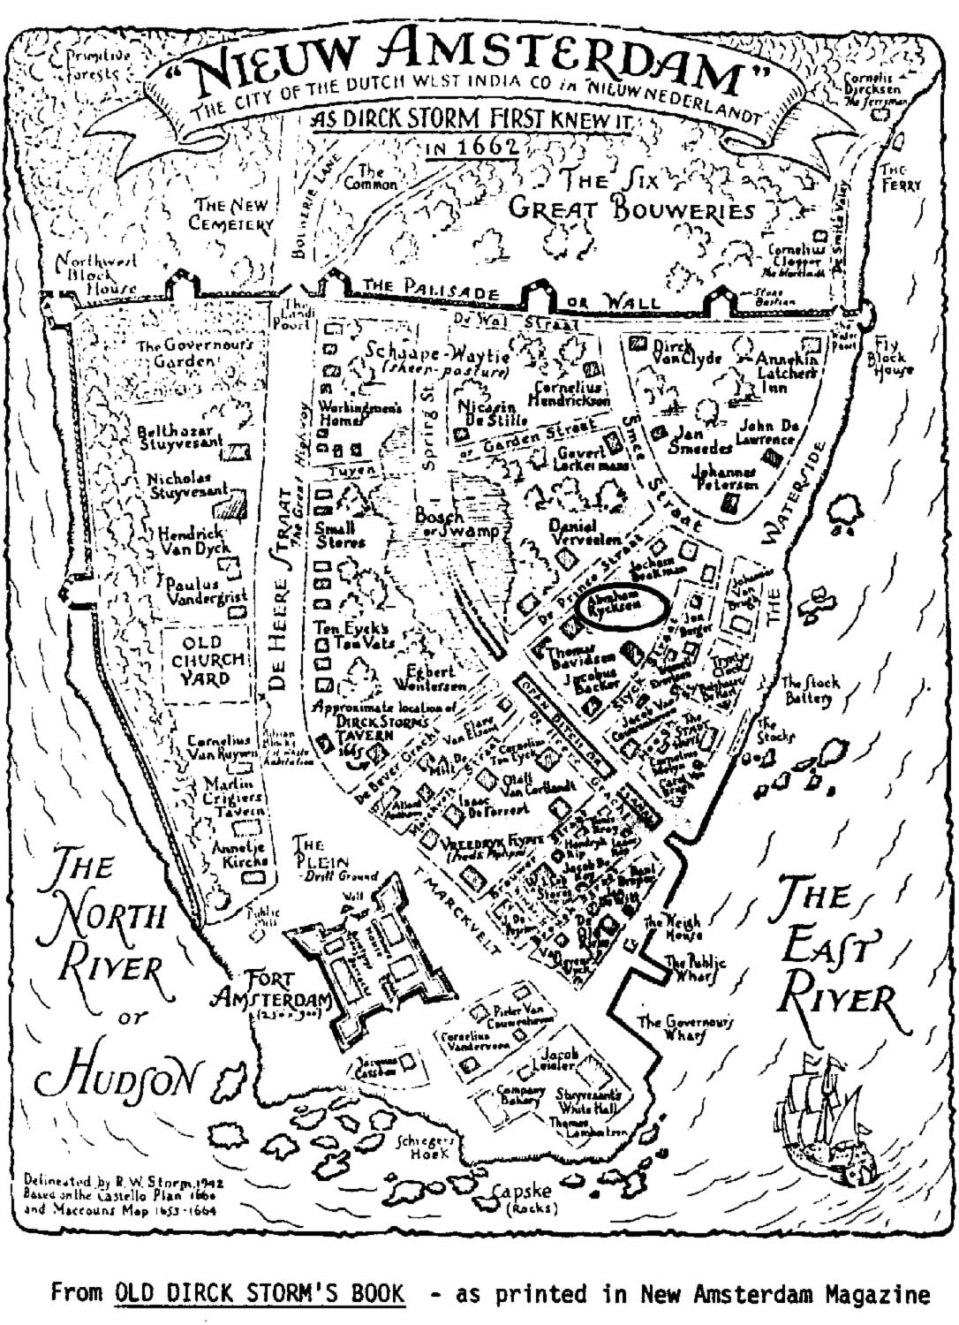 New Amsterdam as Dirck Storm first knew it in 1662